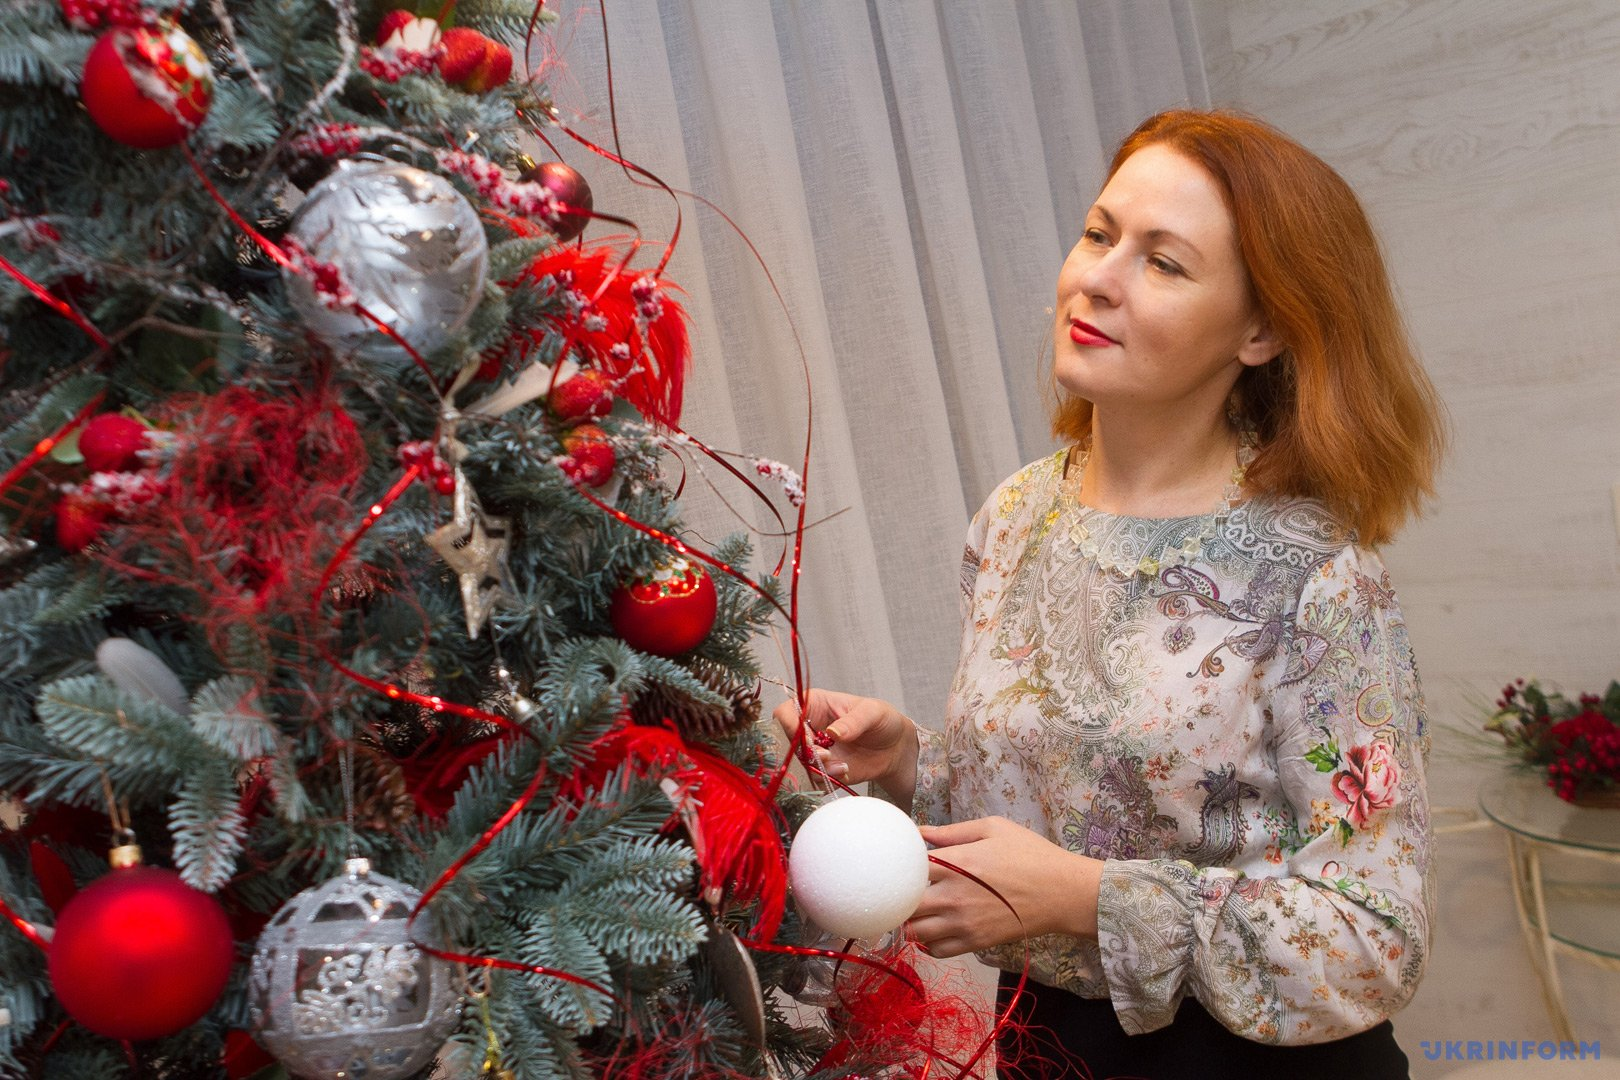 Фото: Нина Ляшонок, Укринформ